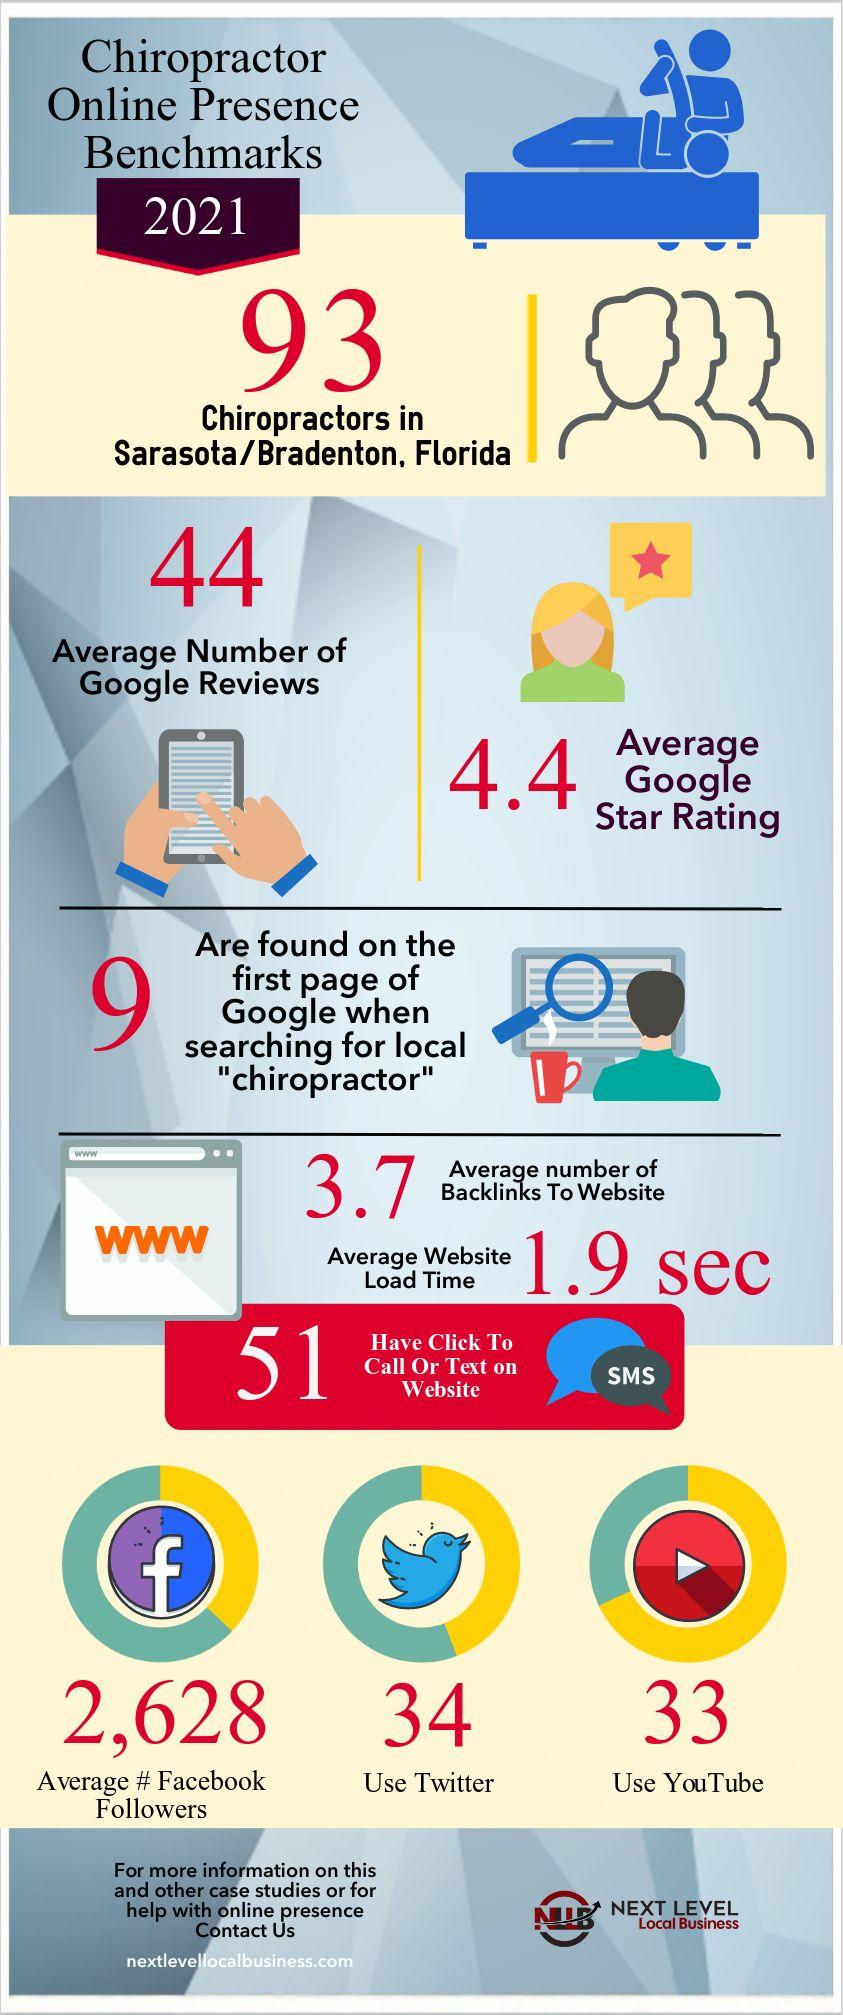 Sarasota Chiropractor Online Presence Case Study